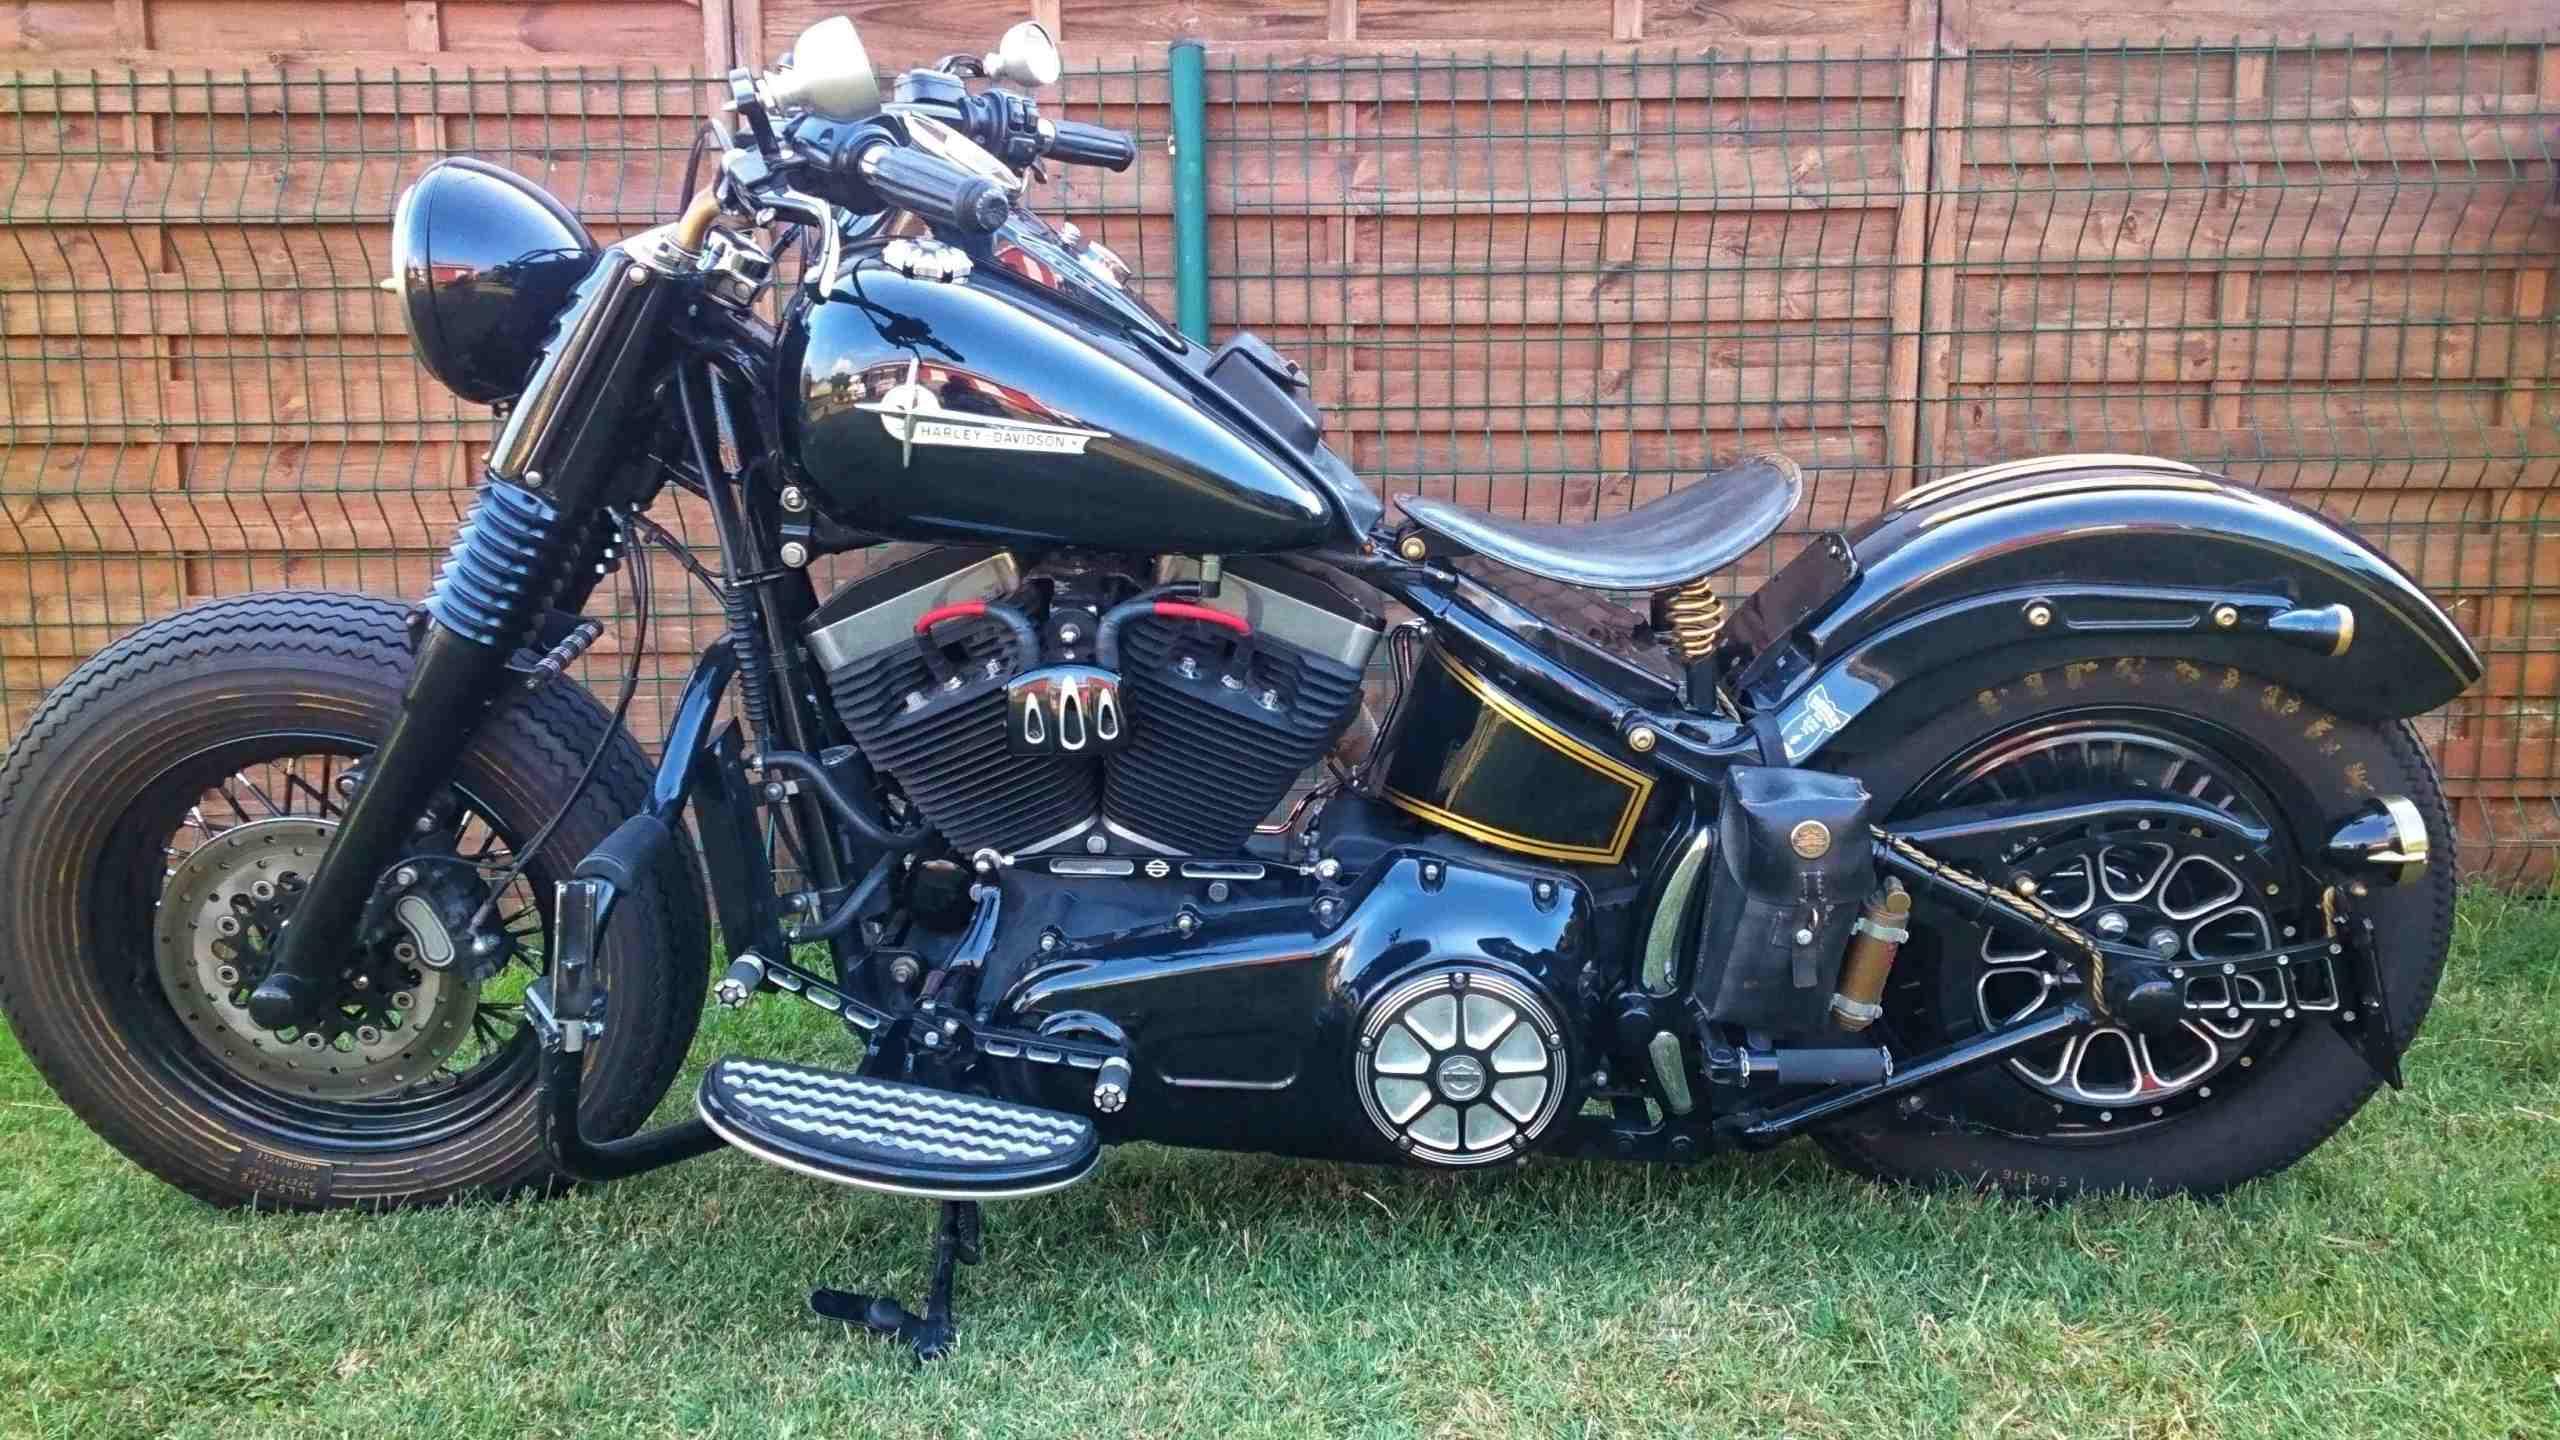 Harley Davidson Softail Slim de 2013